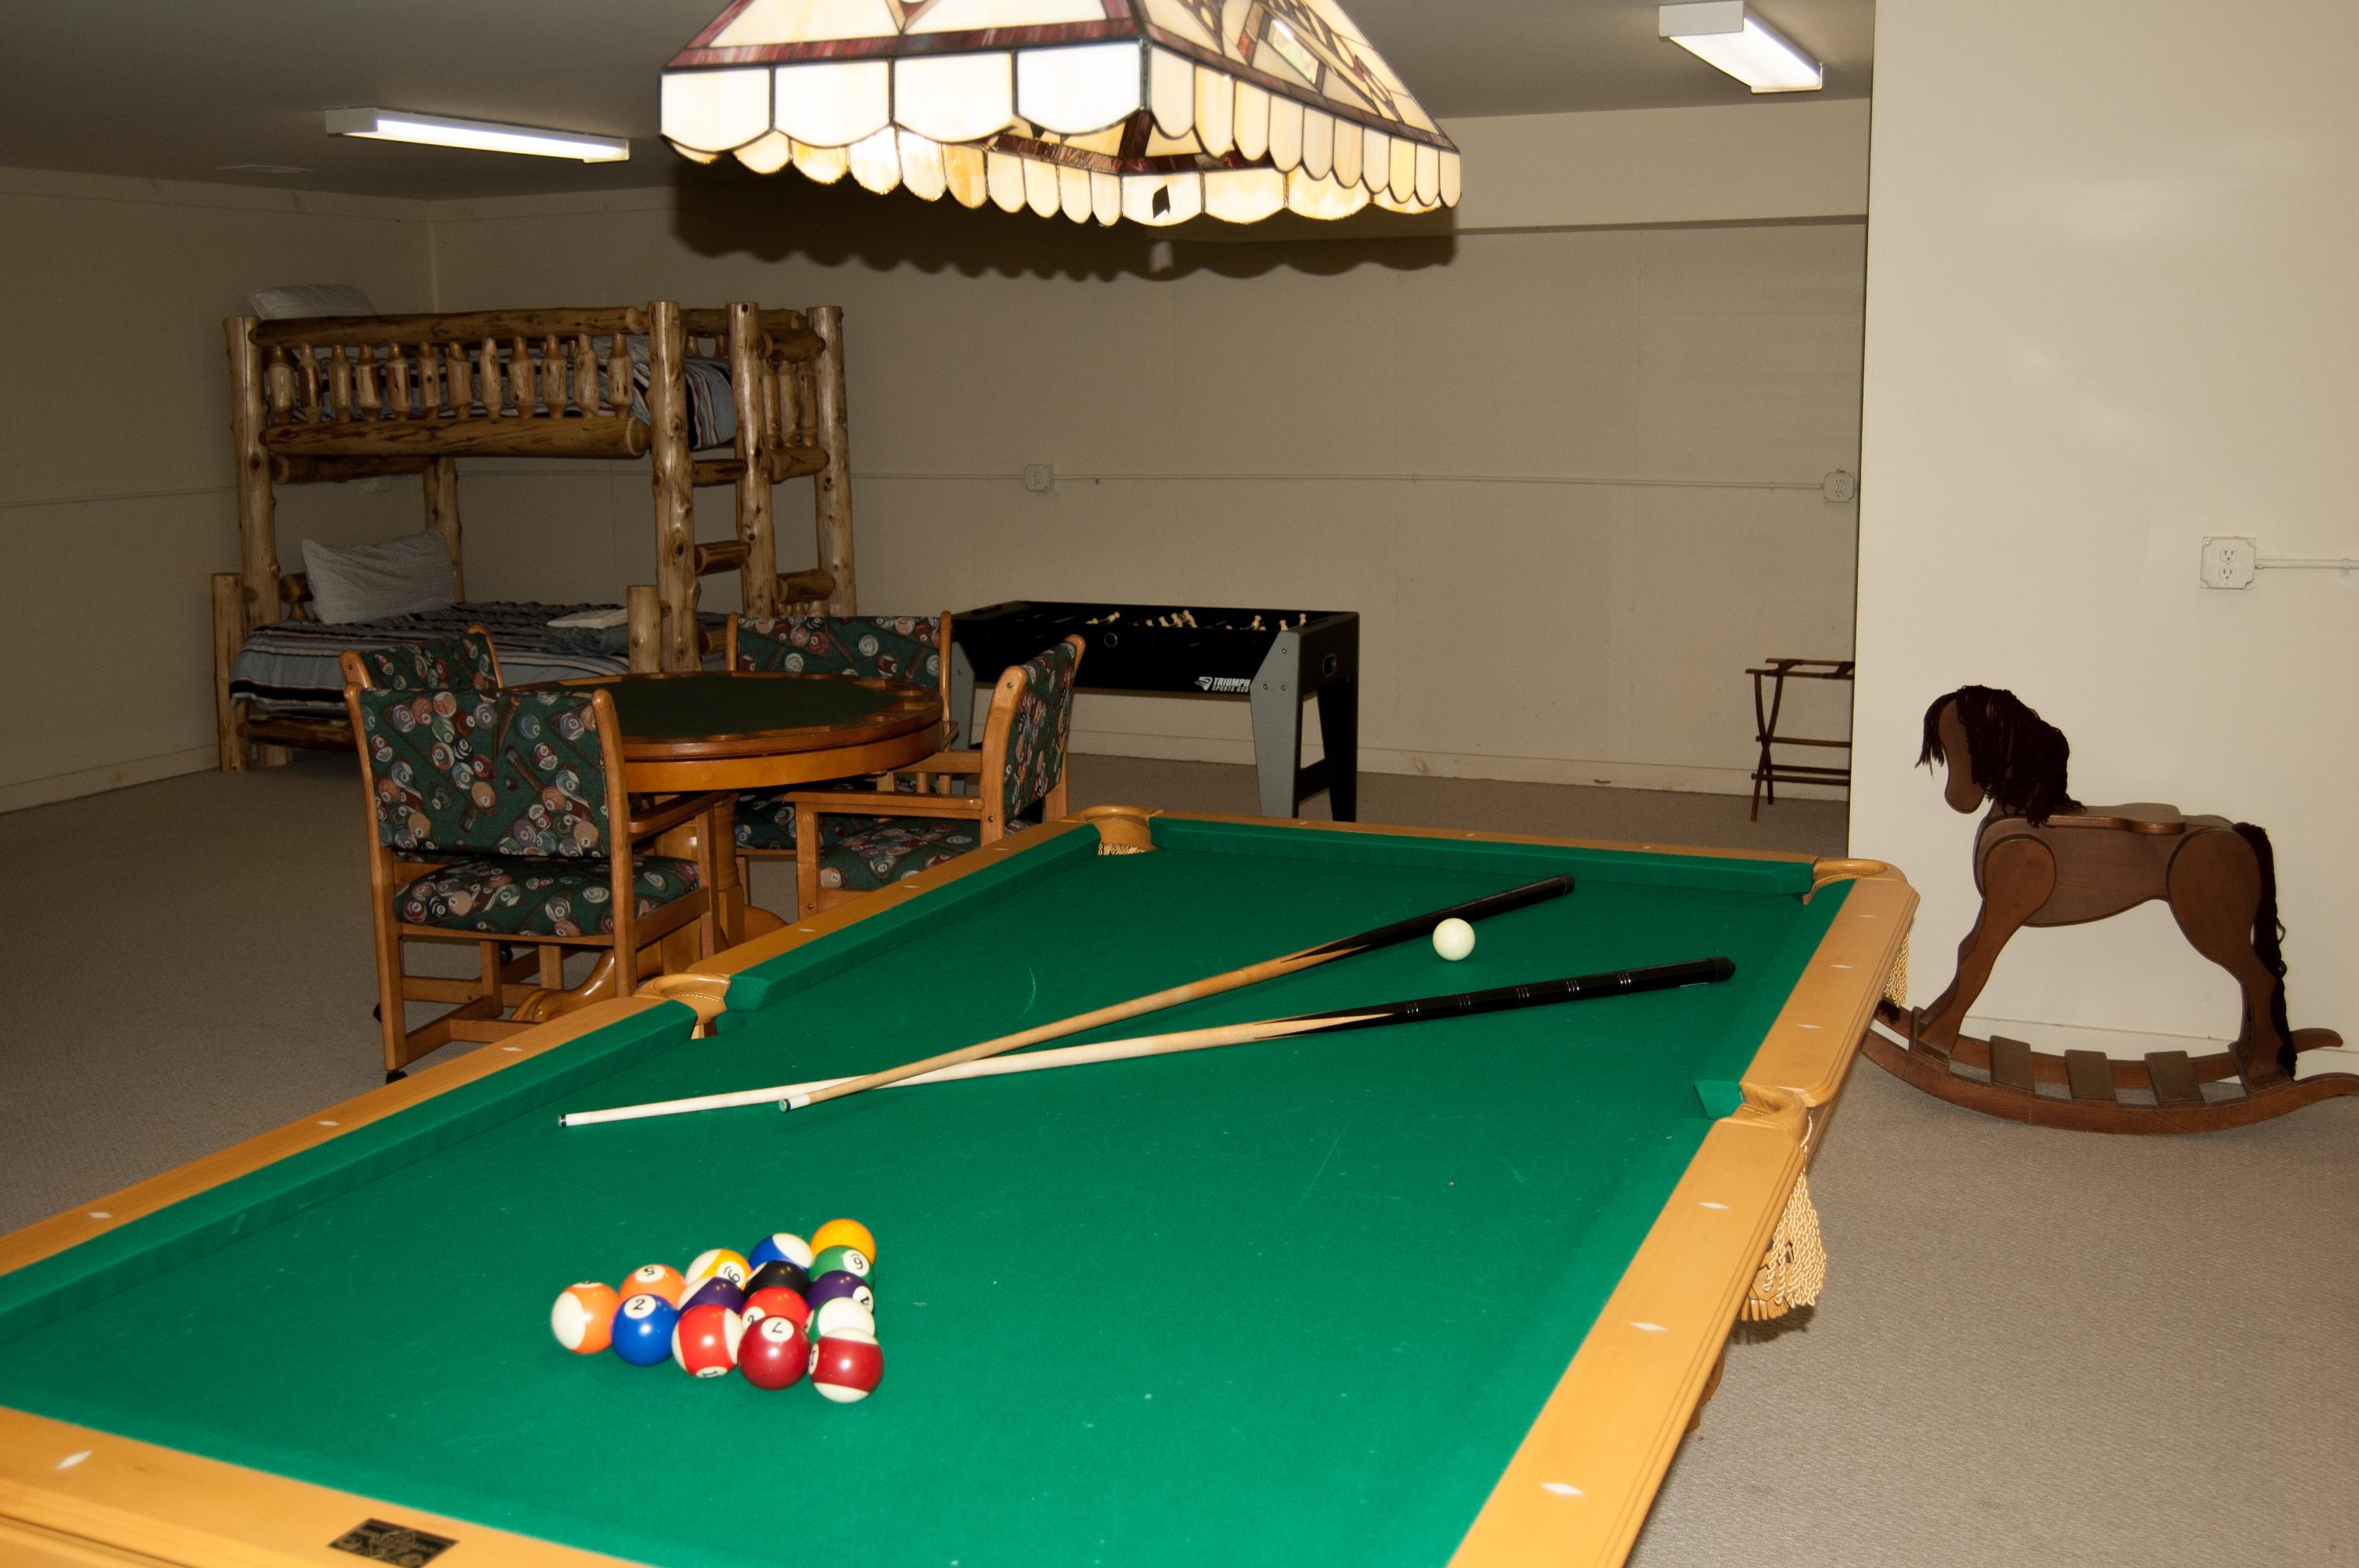 regulation size pool table